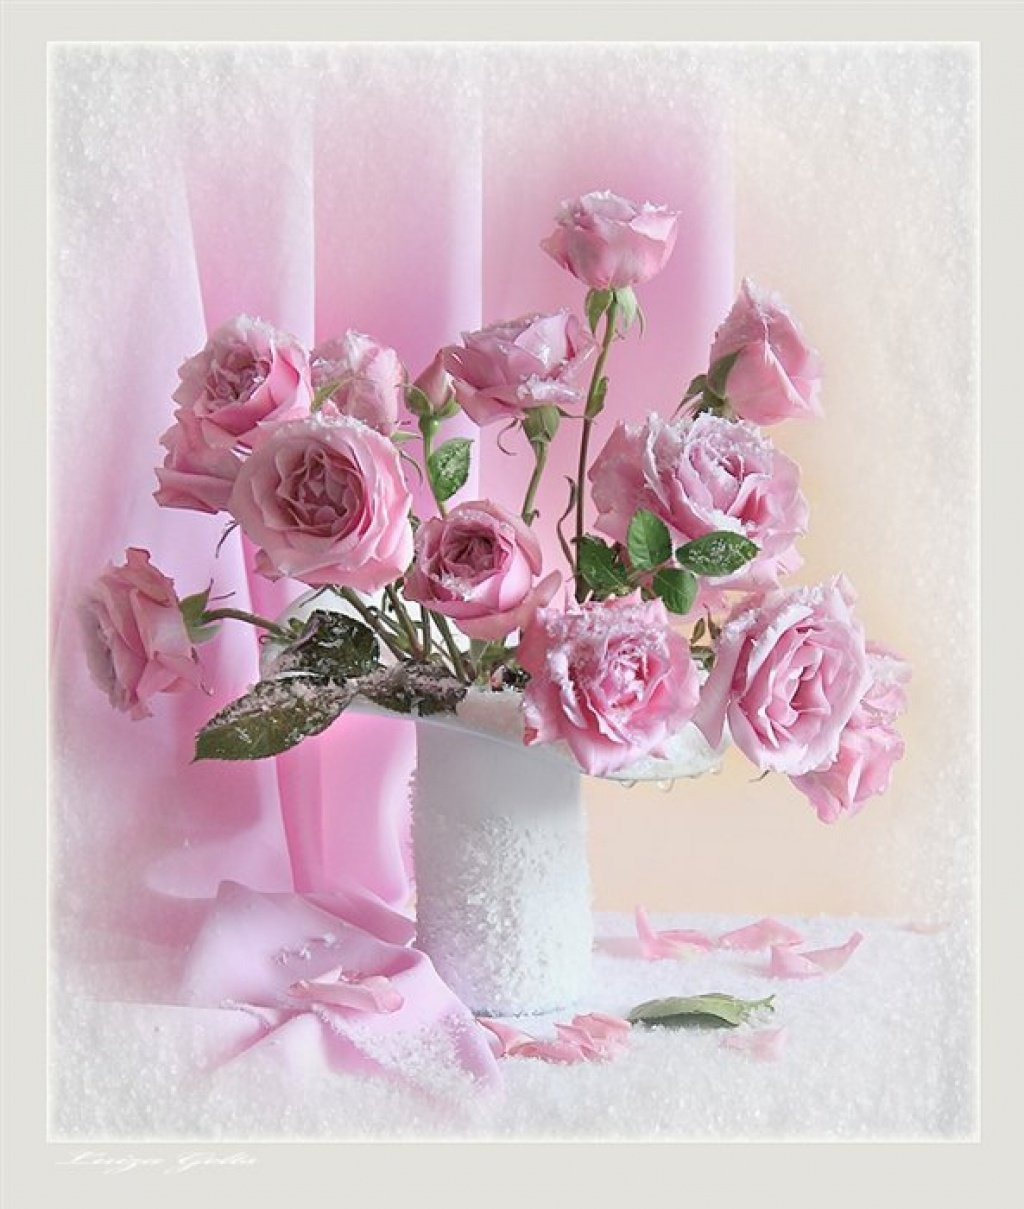 Открытки анимация цветы с юбилеем, брюнетки картинки